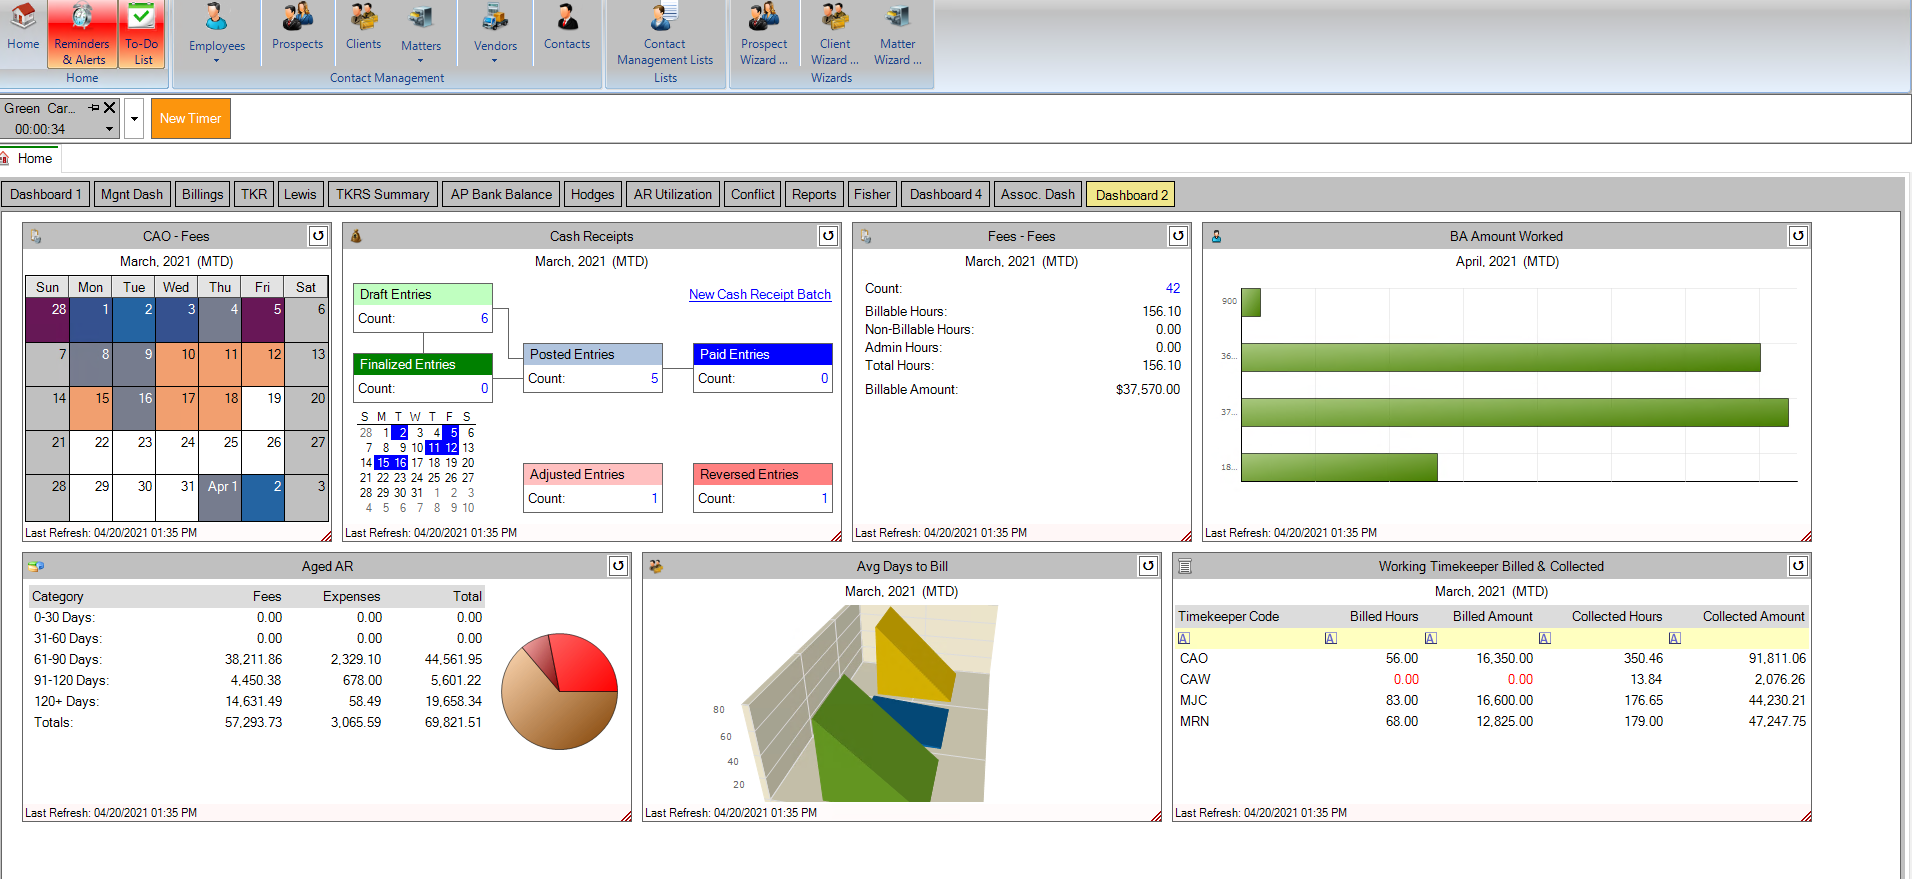 Metrics from Coyote Analytics software